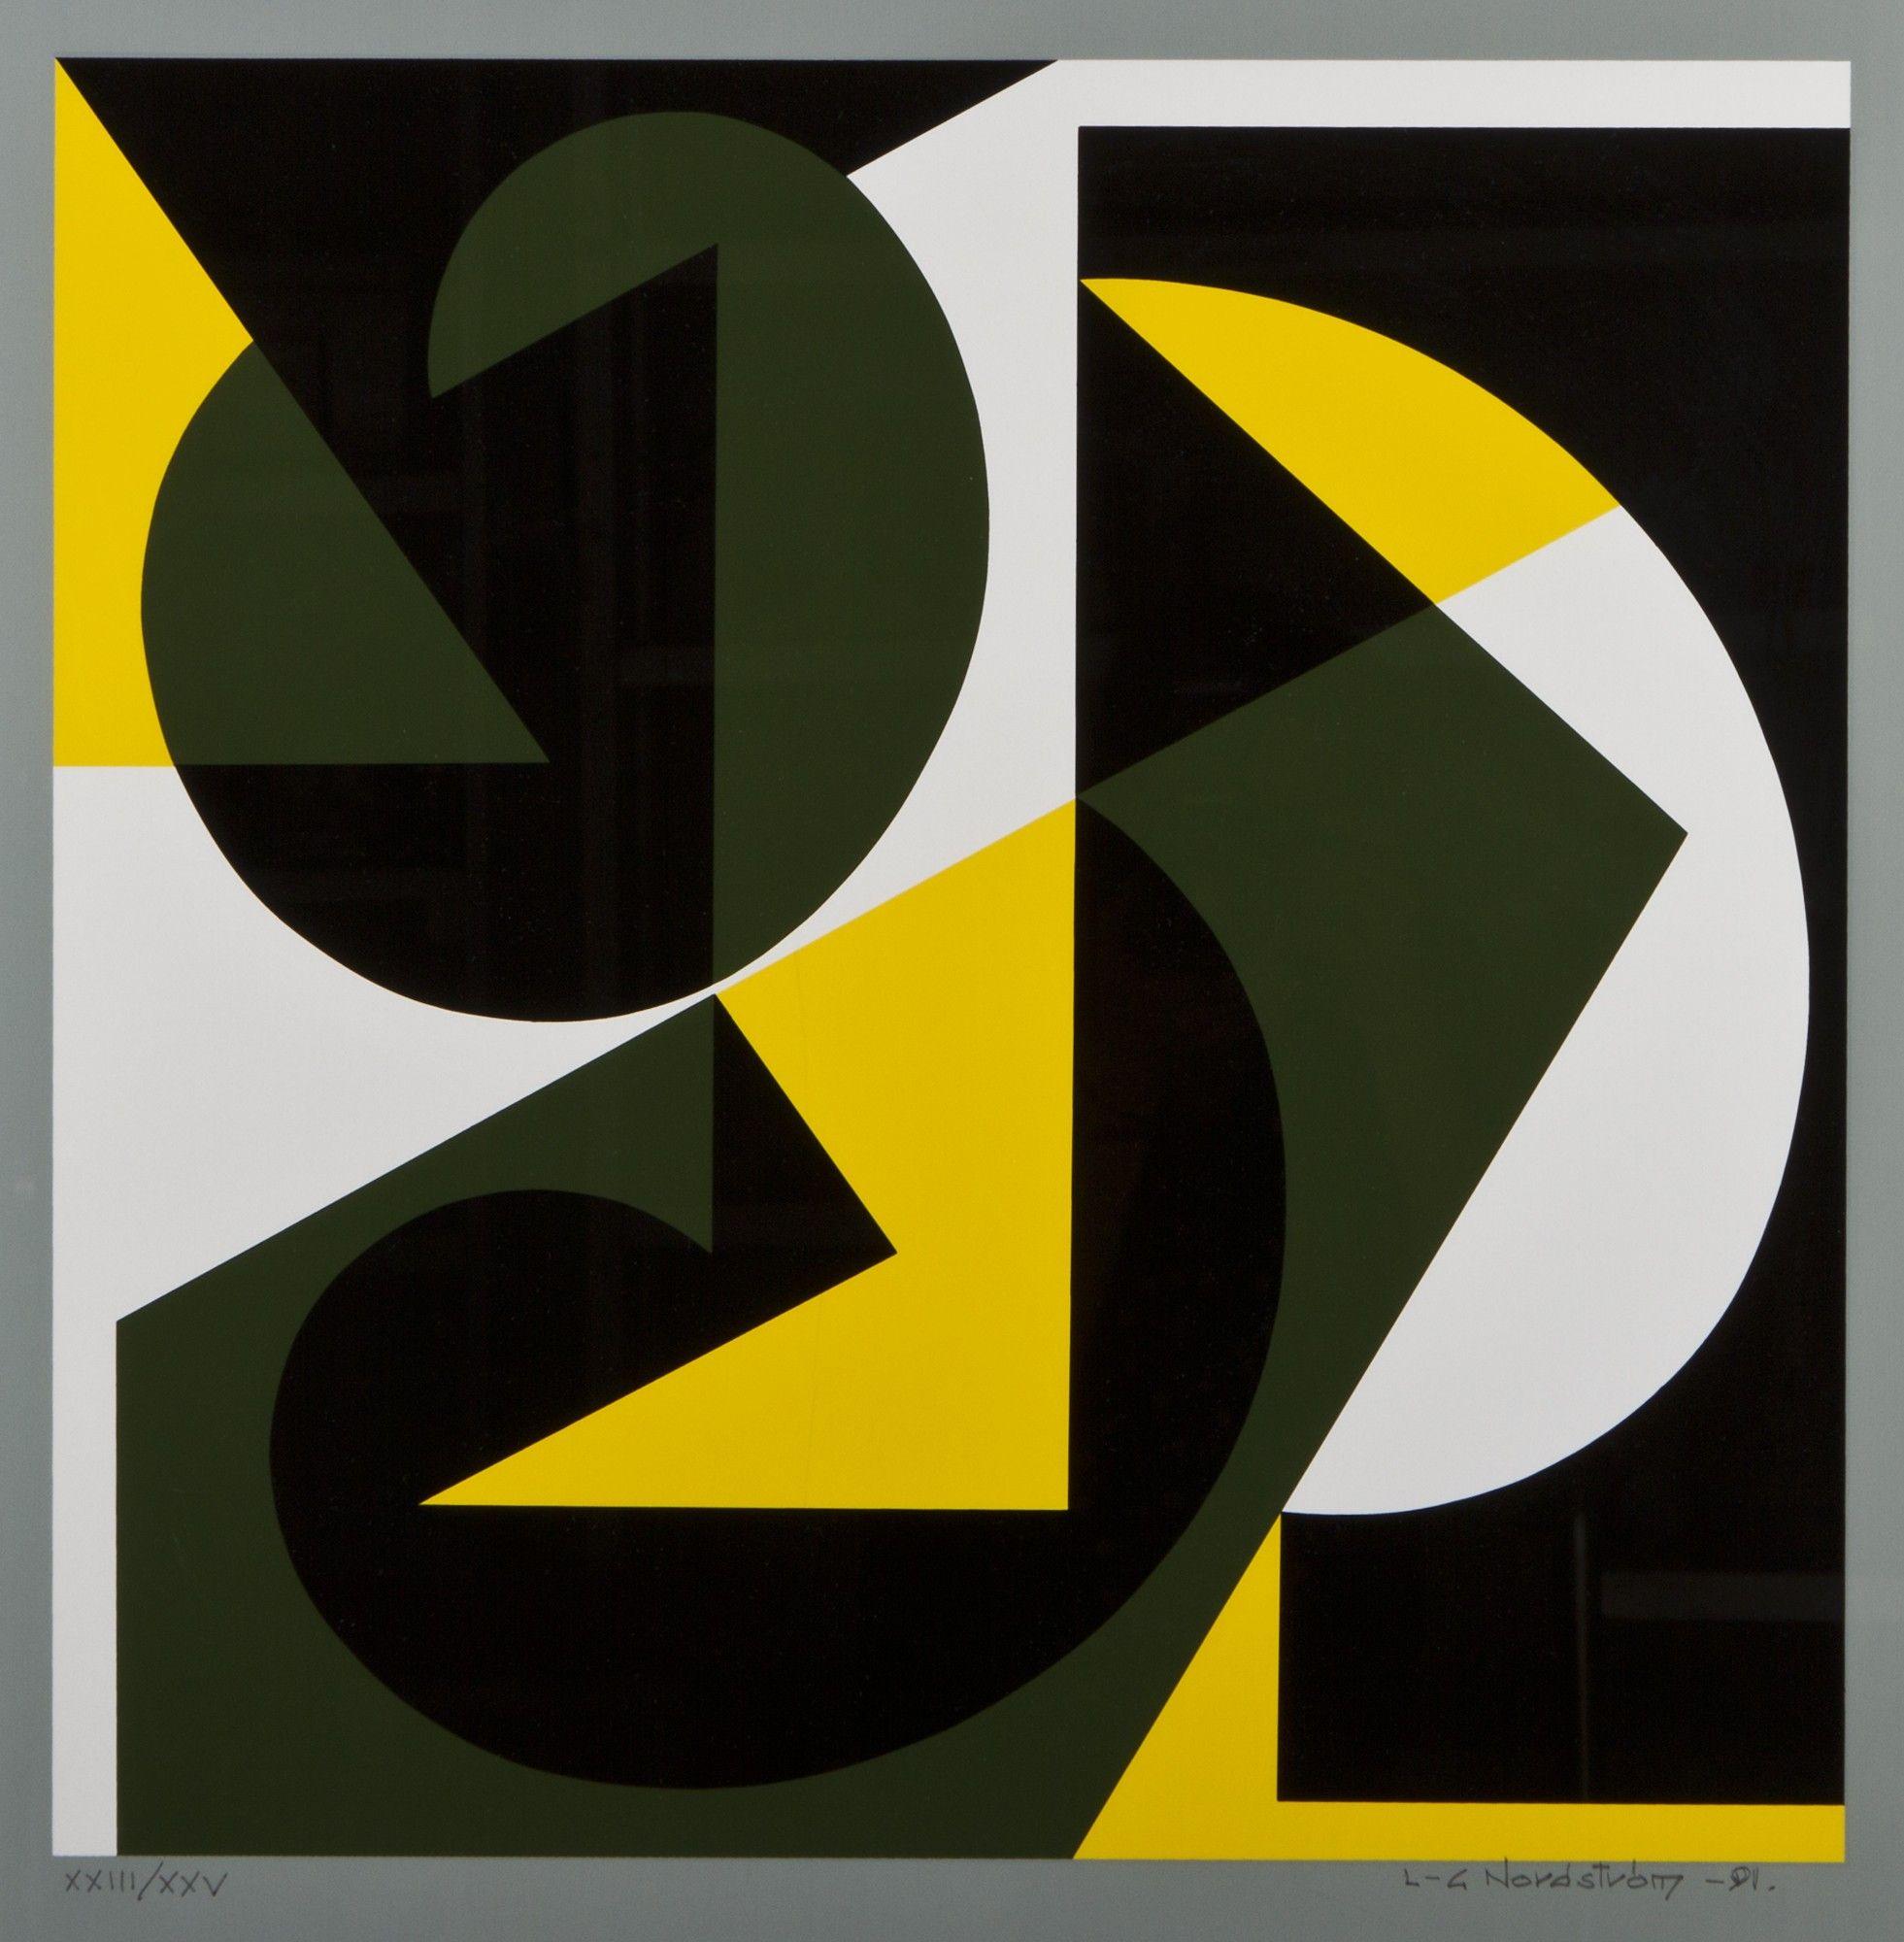 Lars-Gunnar Nordström, 1991, serigrafia, 49x49 cm, edition XXIII/XXV - Hagelstam A136